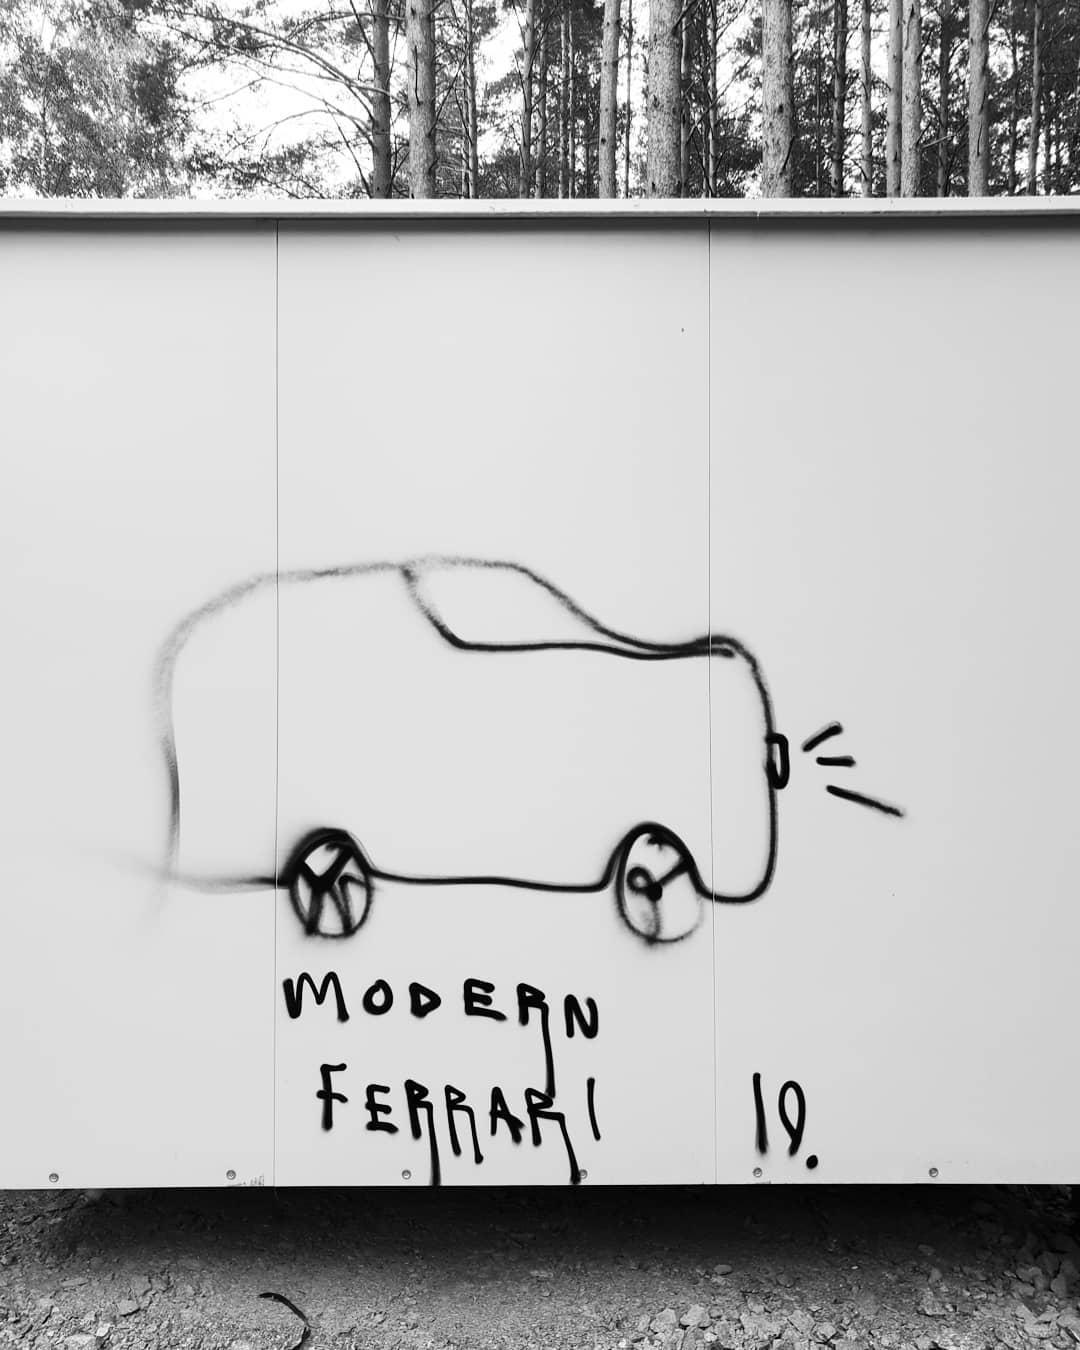 Modern Ferrari